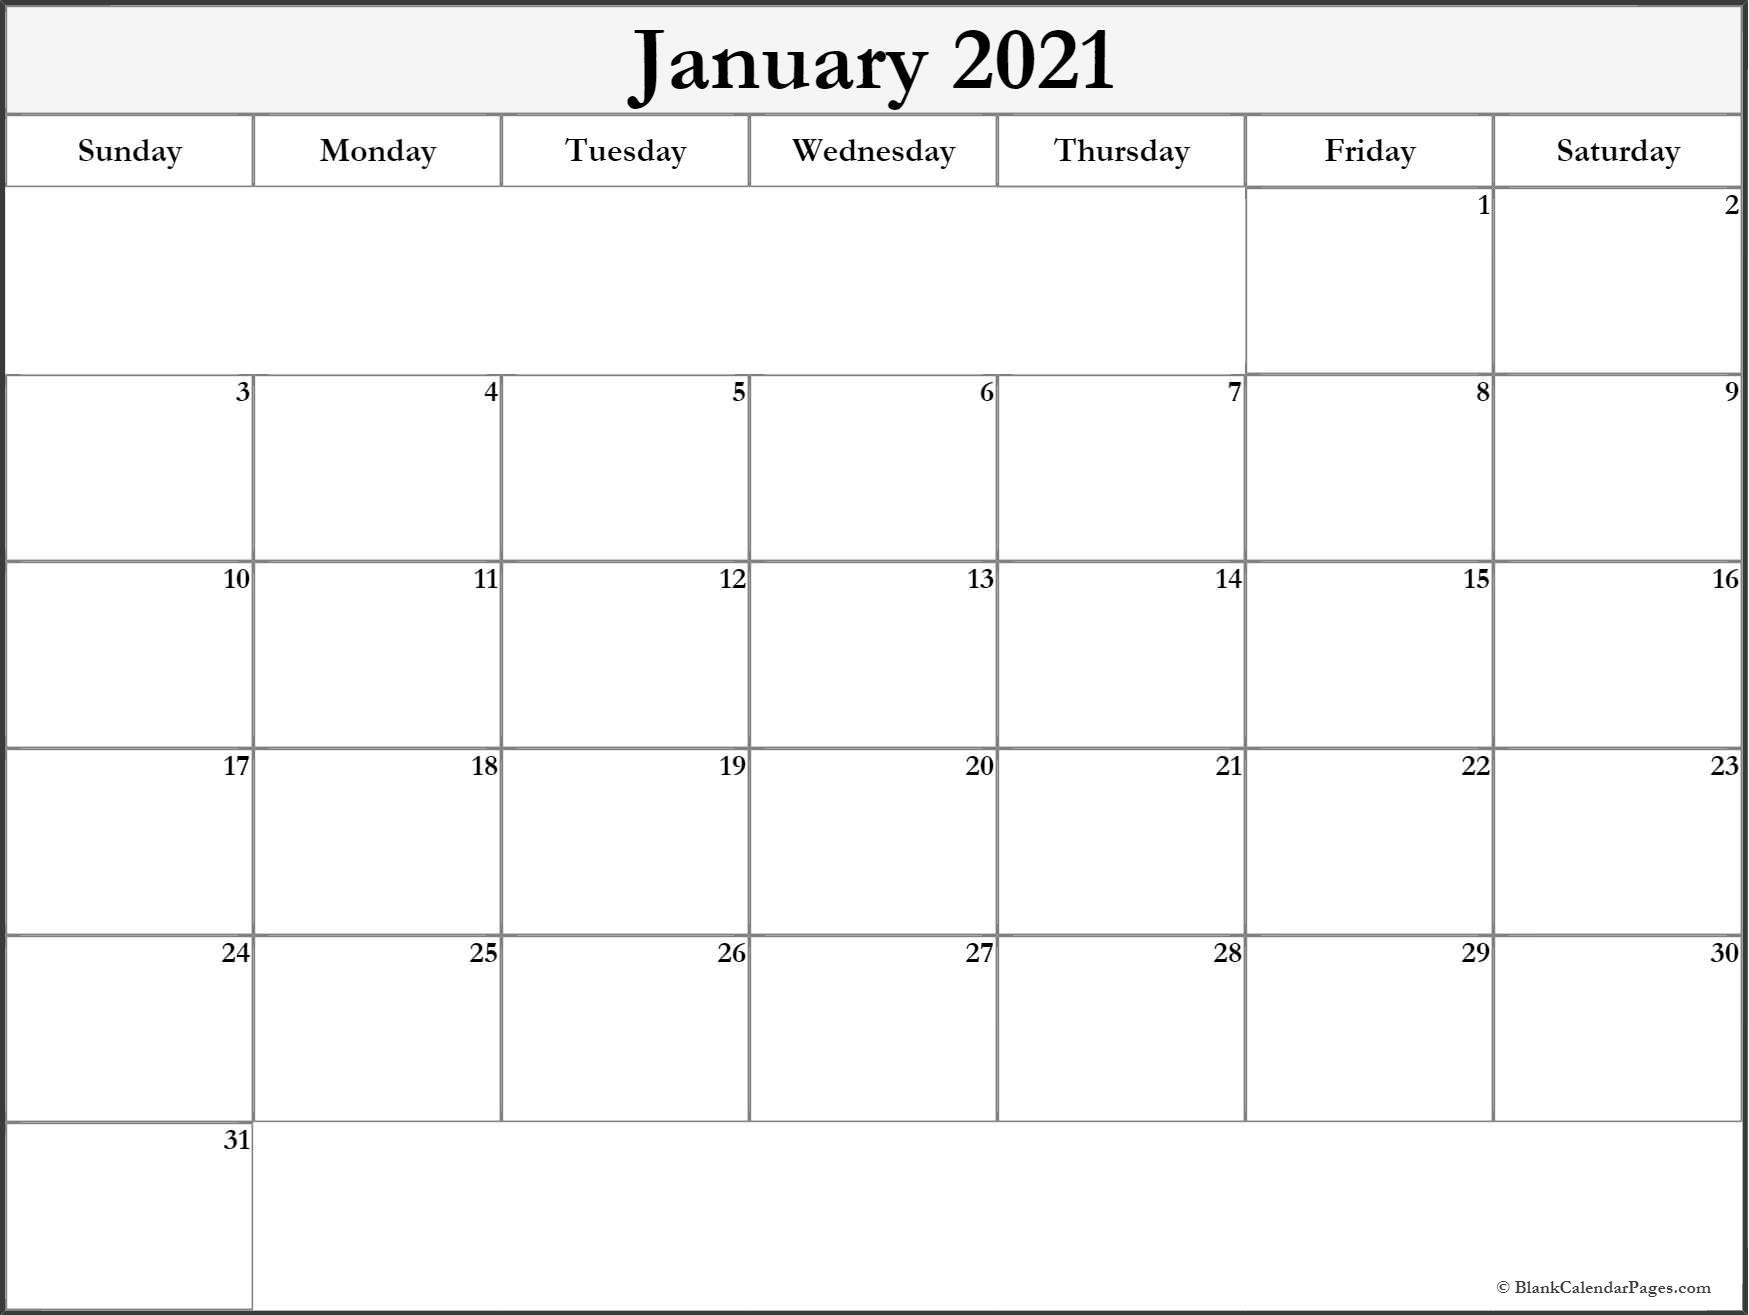 January 2021 Blank Calendar Collection 1